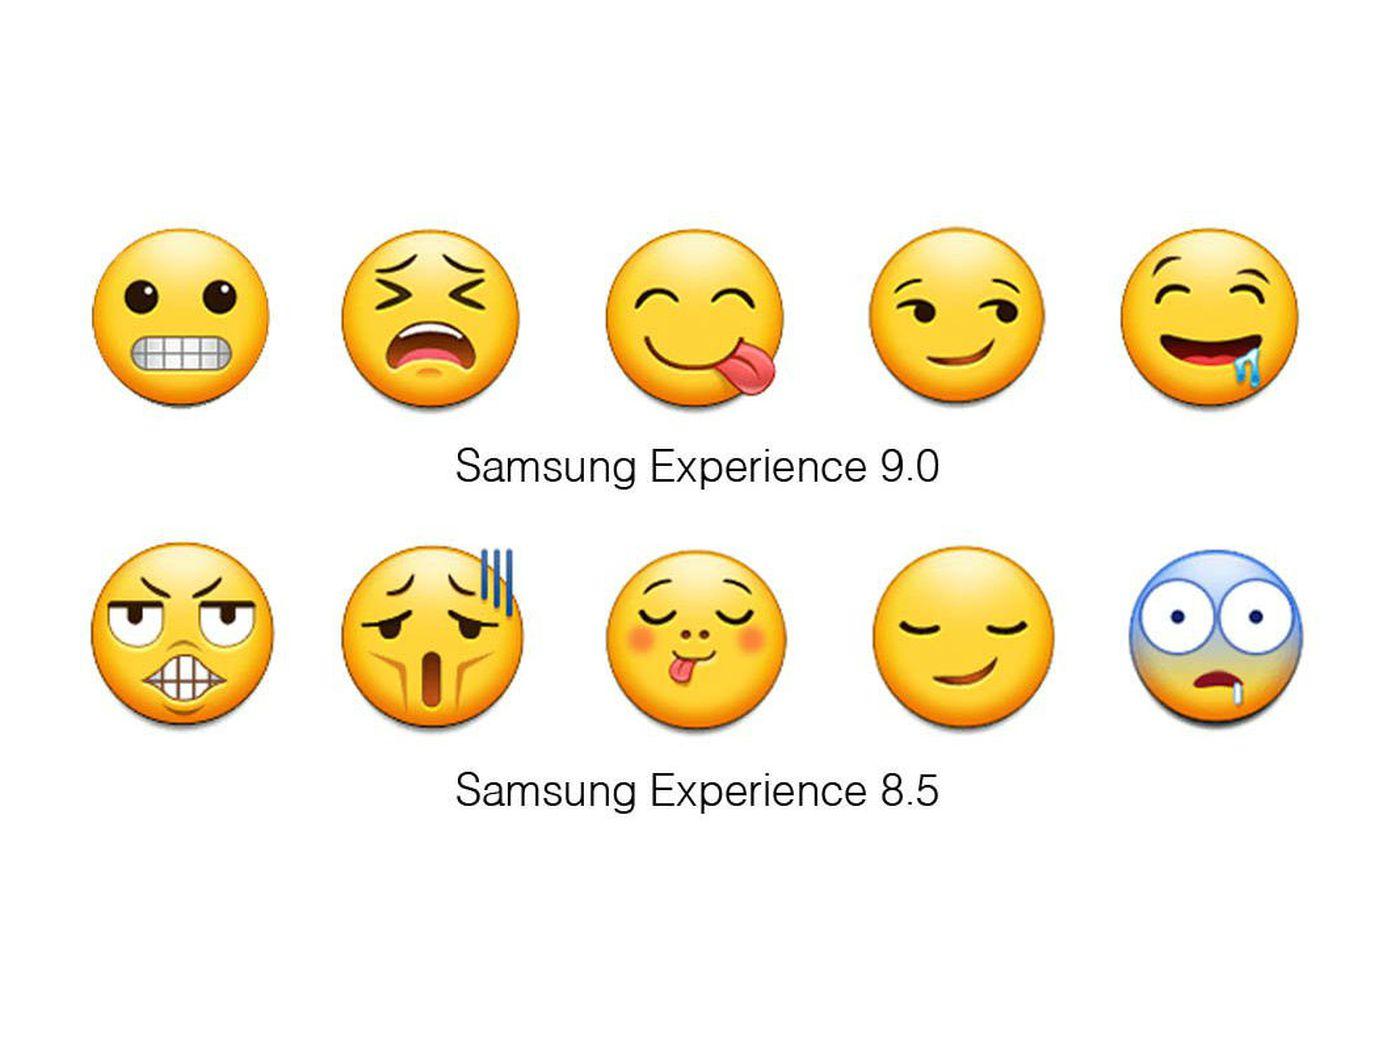 Samsung Is Finally Updating Its Terrible Emoji The Verge